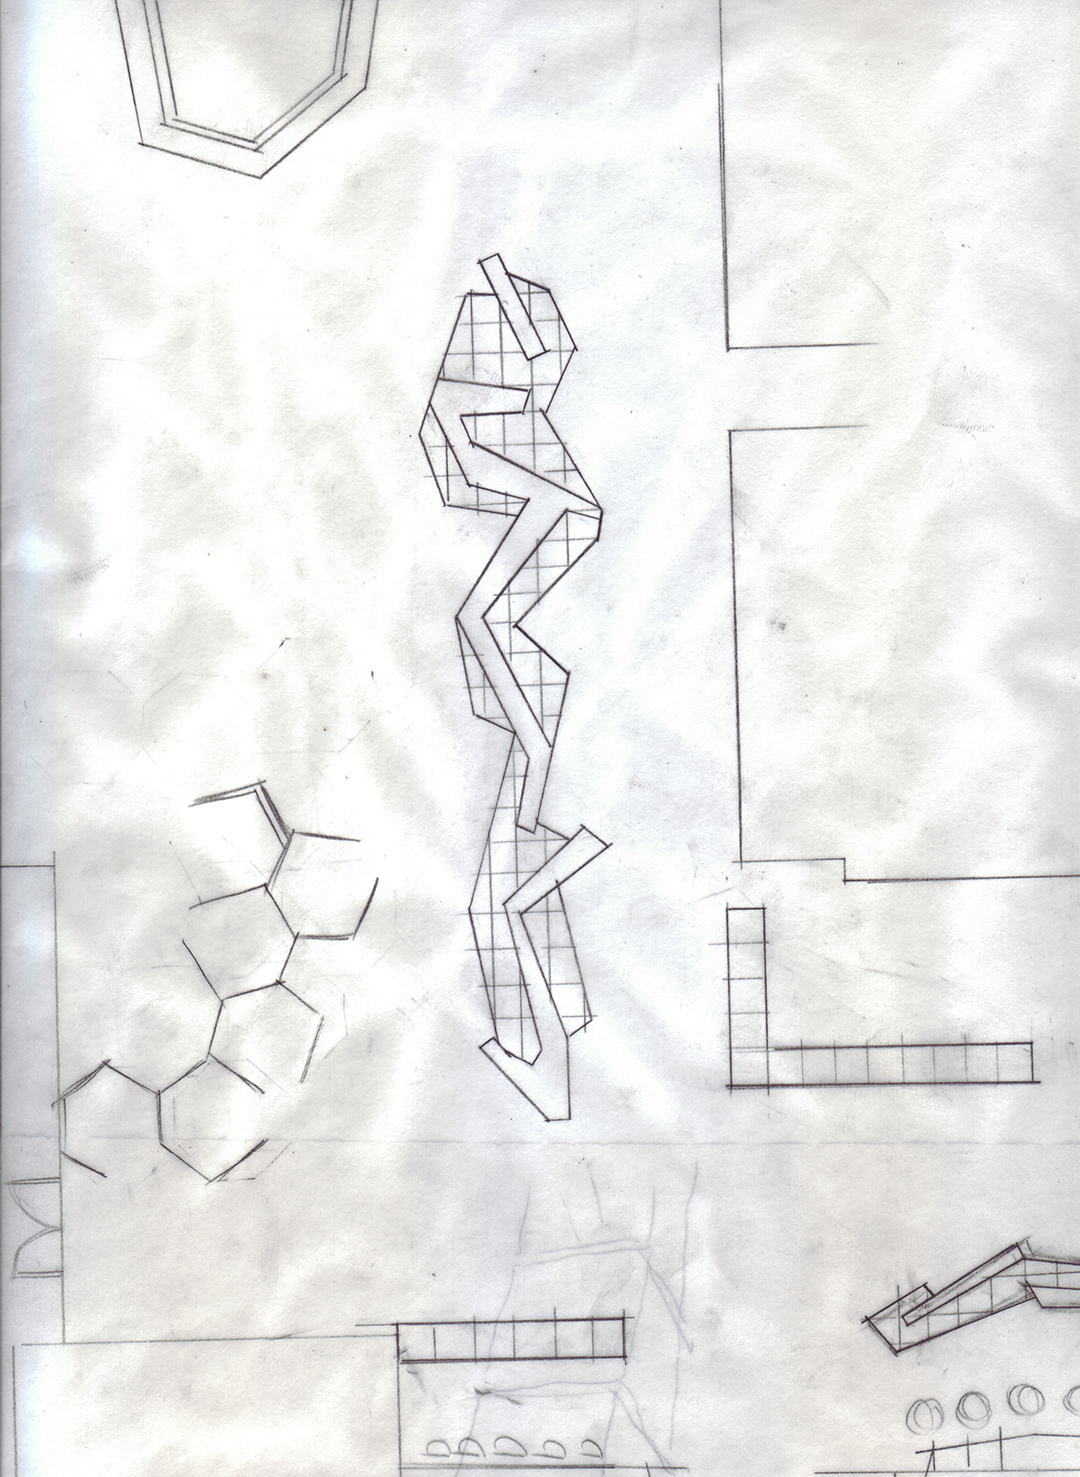 Lobby 1 - 2012-02-16